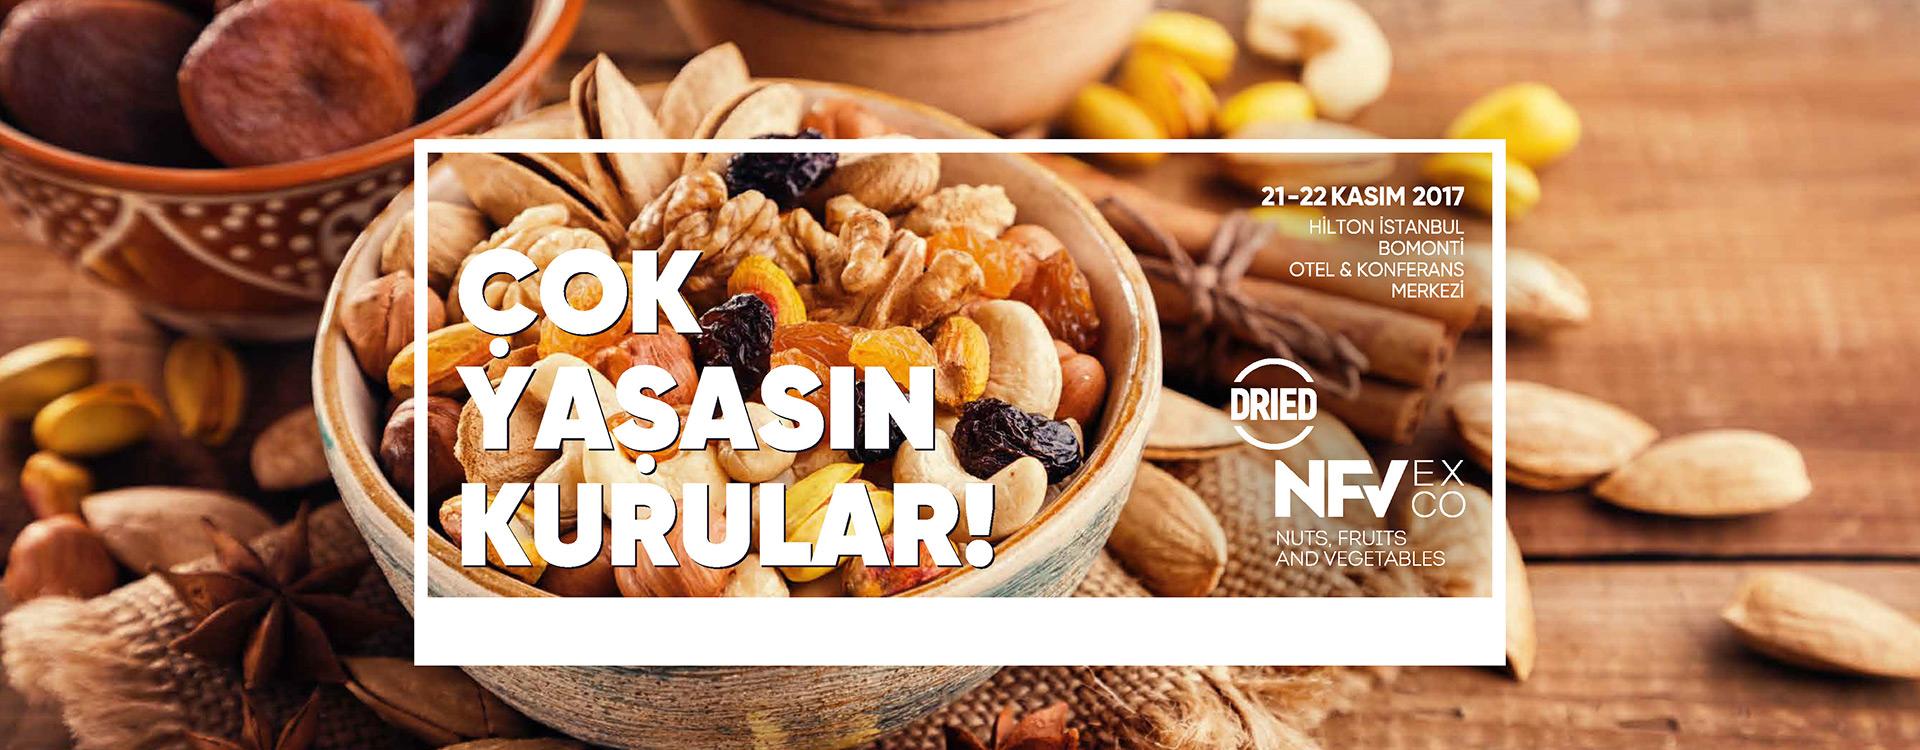 nfv-exco-dried-da-kuruyemis-ve-kuru-meyve-sektoru-masaya-yatirilacak